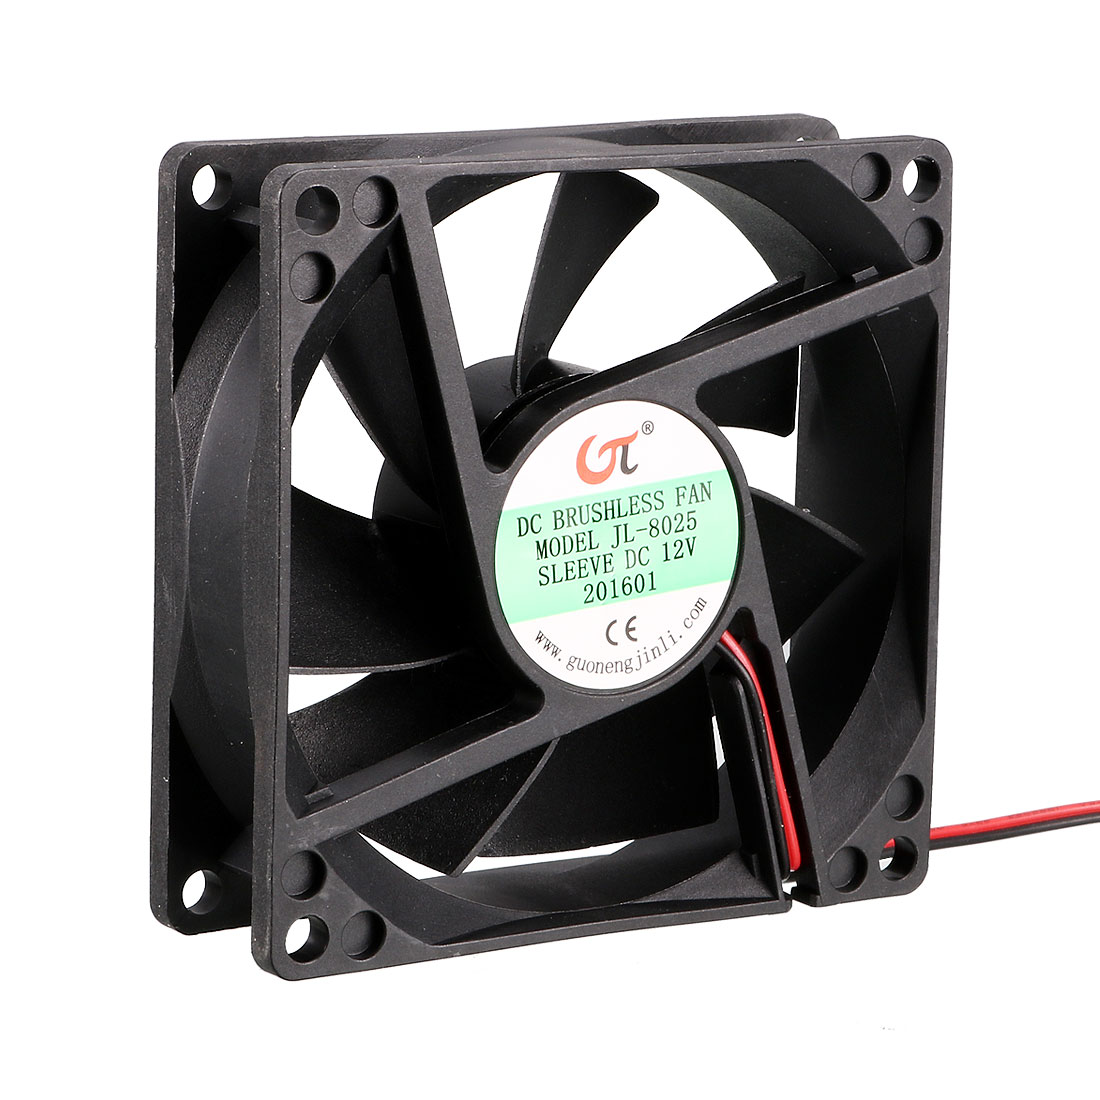 80mm x 80mm x 25mm 12V DC Cooling Fan Long Life Sleeve Bearing Computer Case Fan